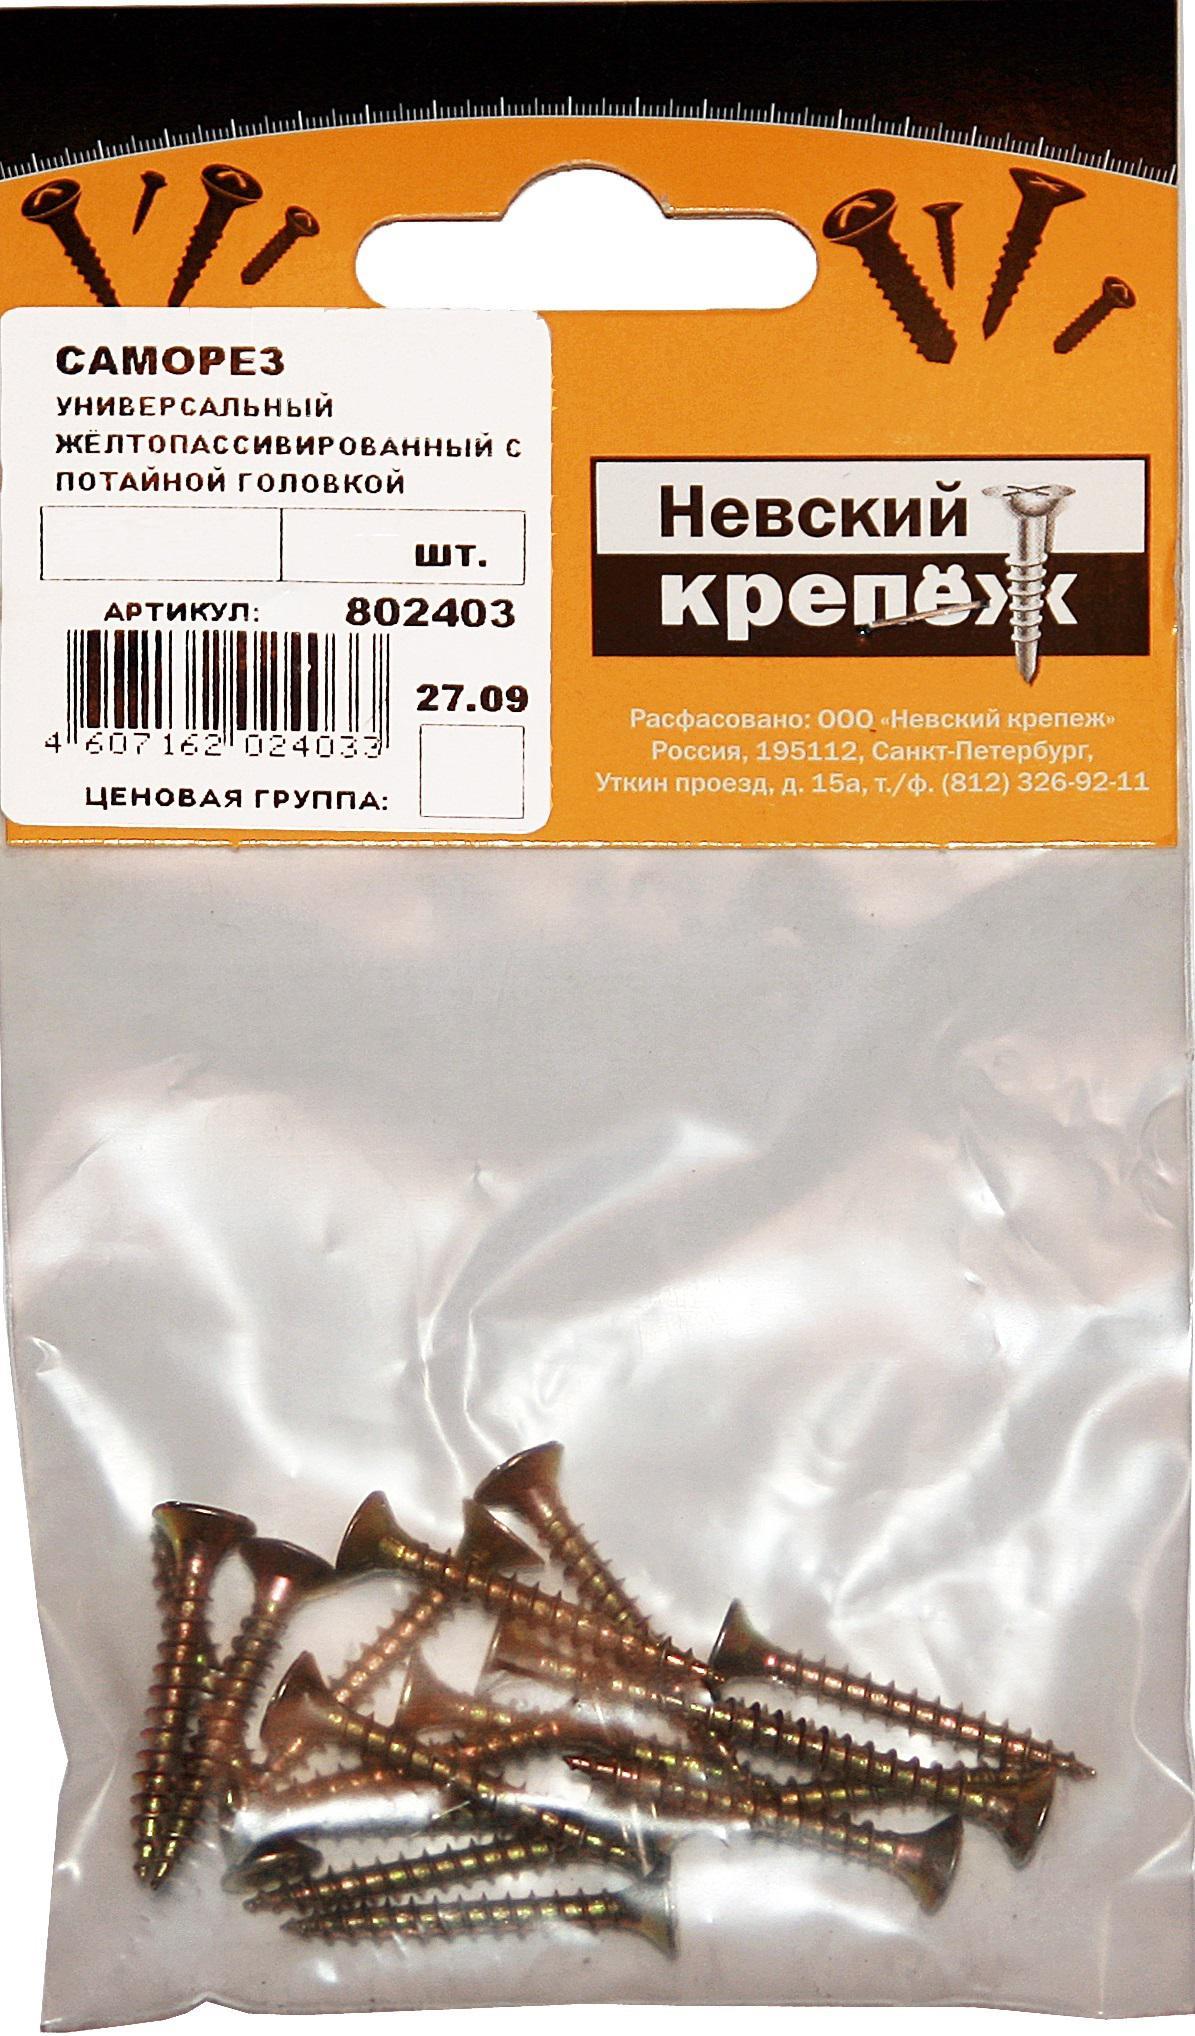 Саморез НЕВСКИЙ КРЕПЕЖ 802388